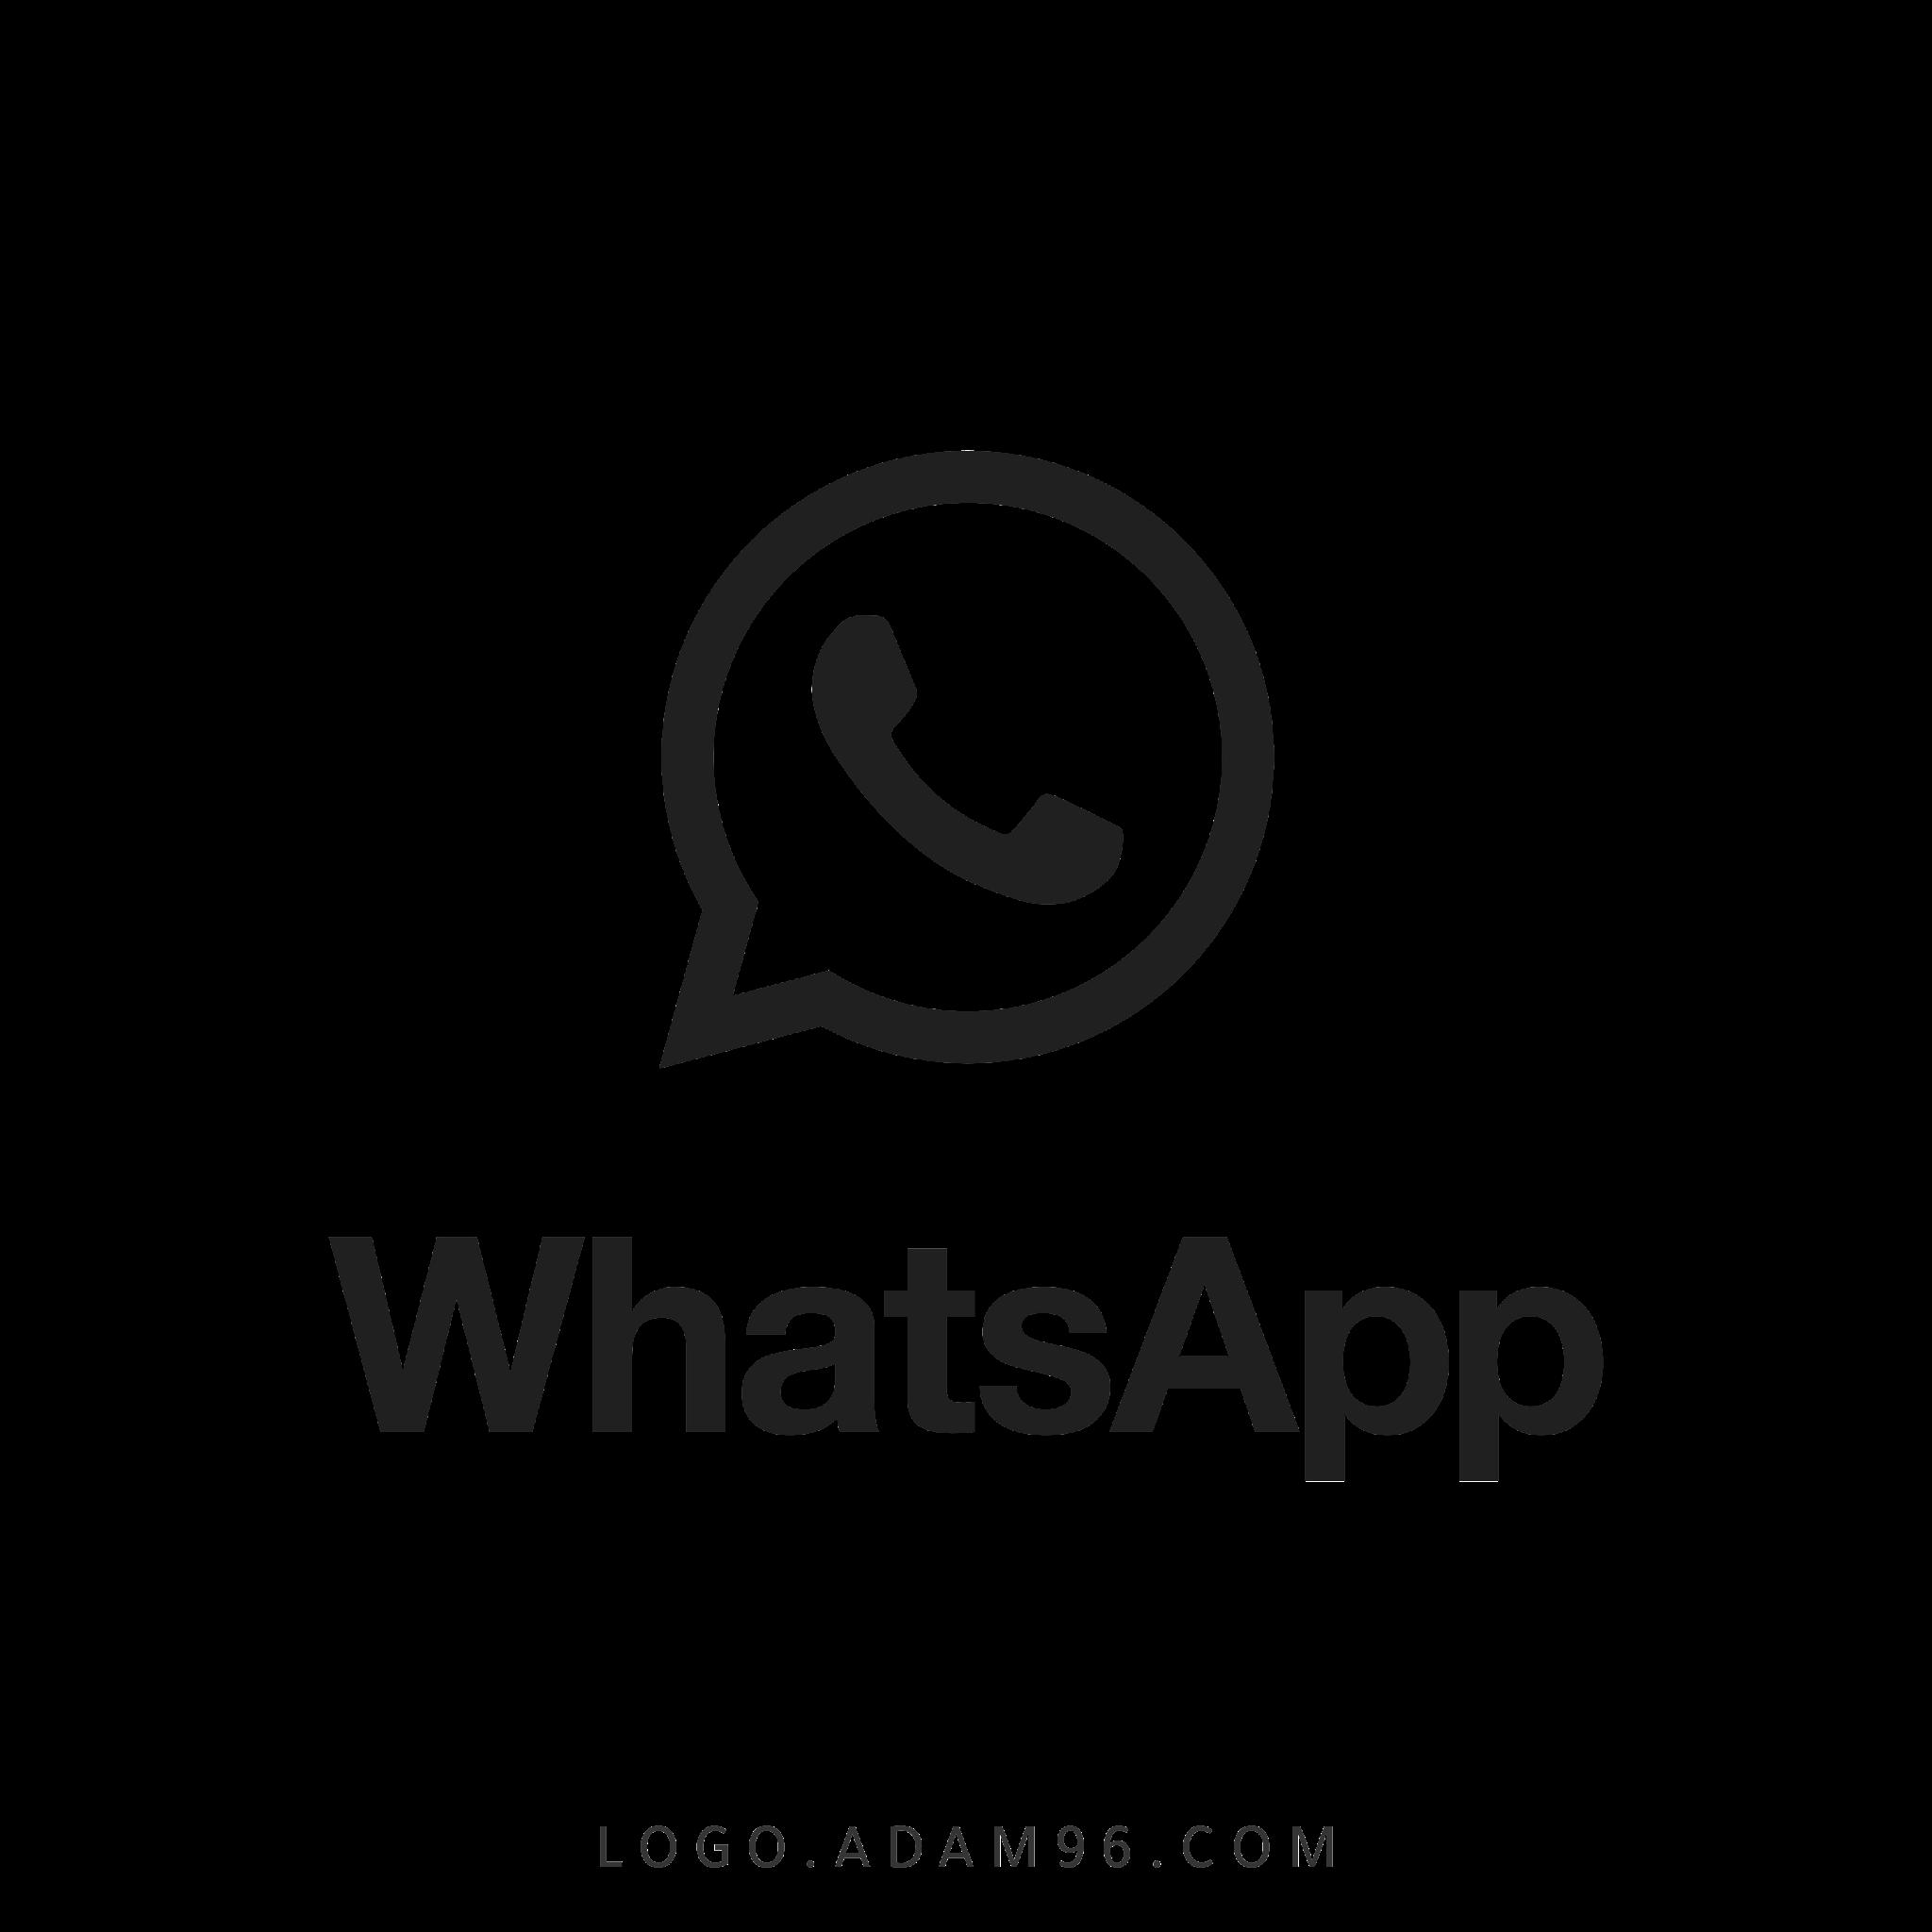 تحميل شعار واتساب اسود شفاف Logo Black Whatsapp PNG